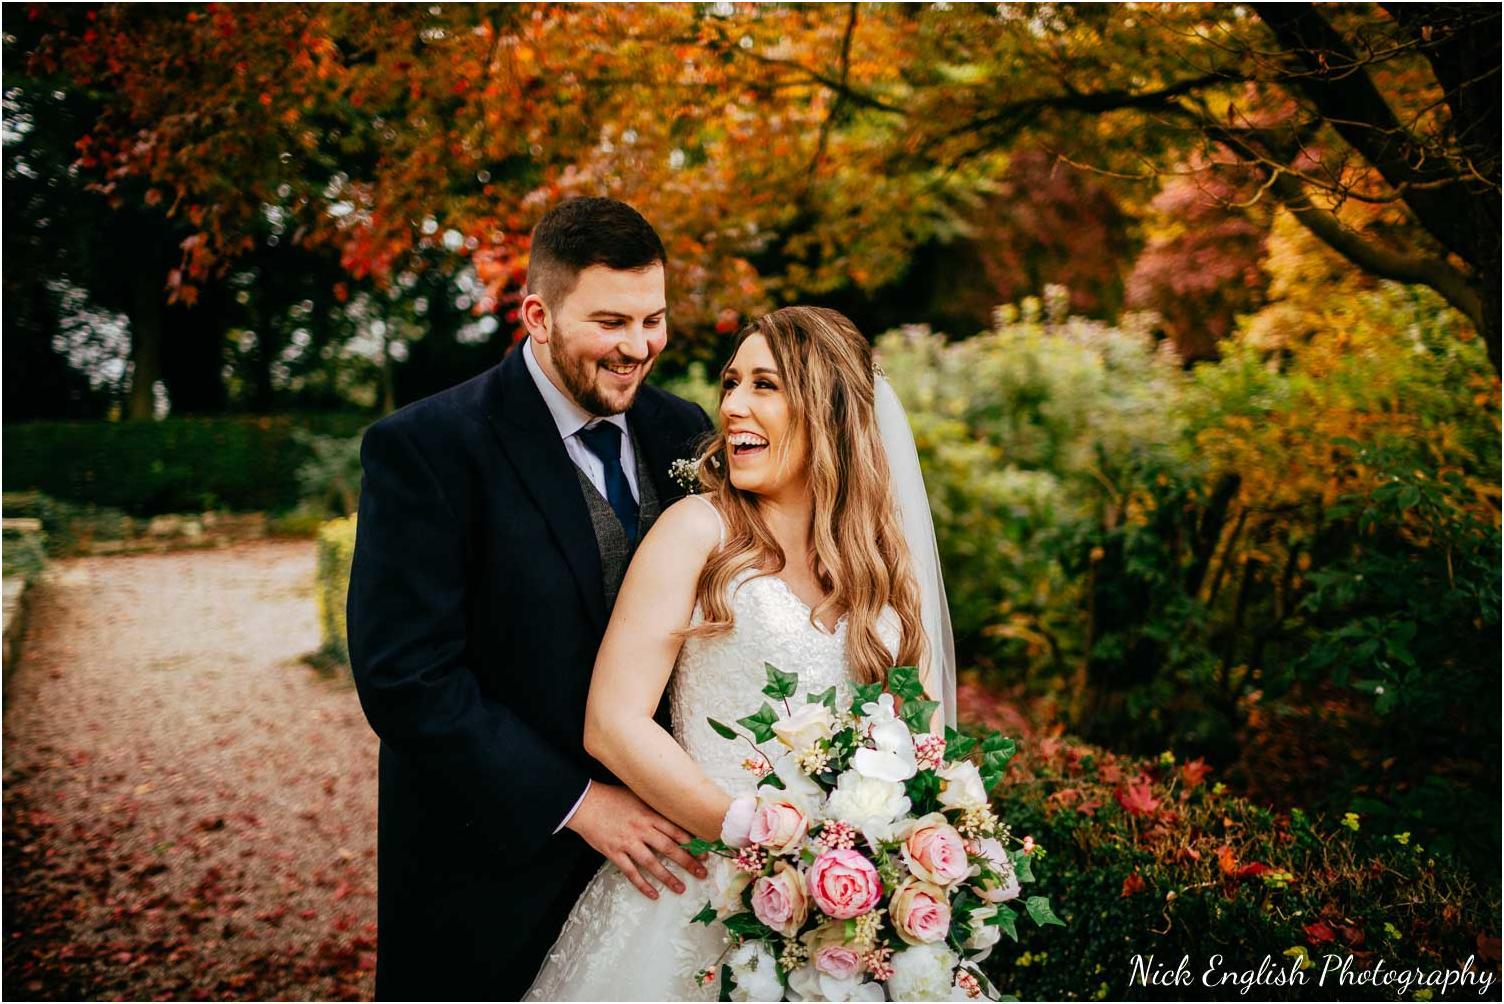 Lancashire_Wedding_Photographer-2-2.jpg